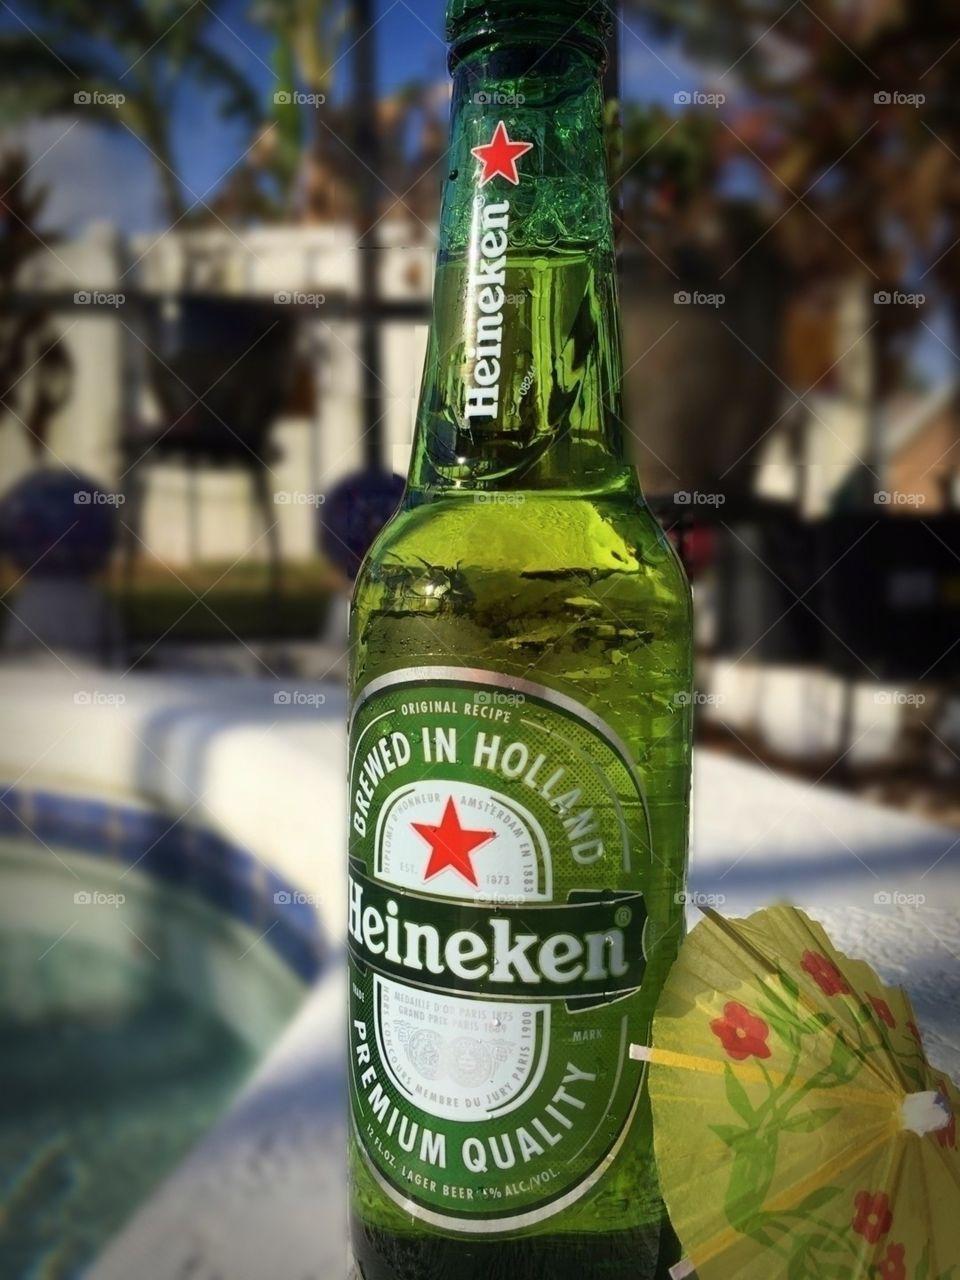 Heineken long exposure with mini yellow umbrella by pool